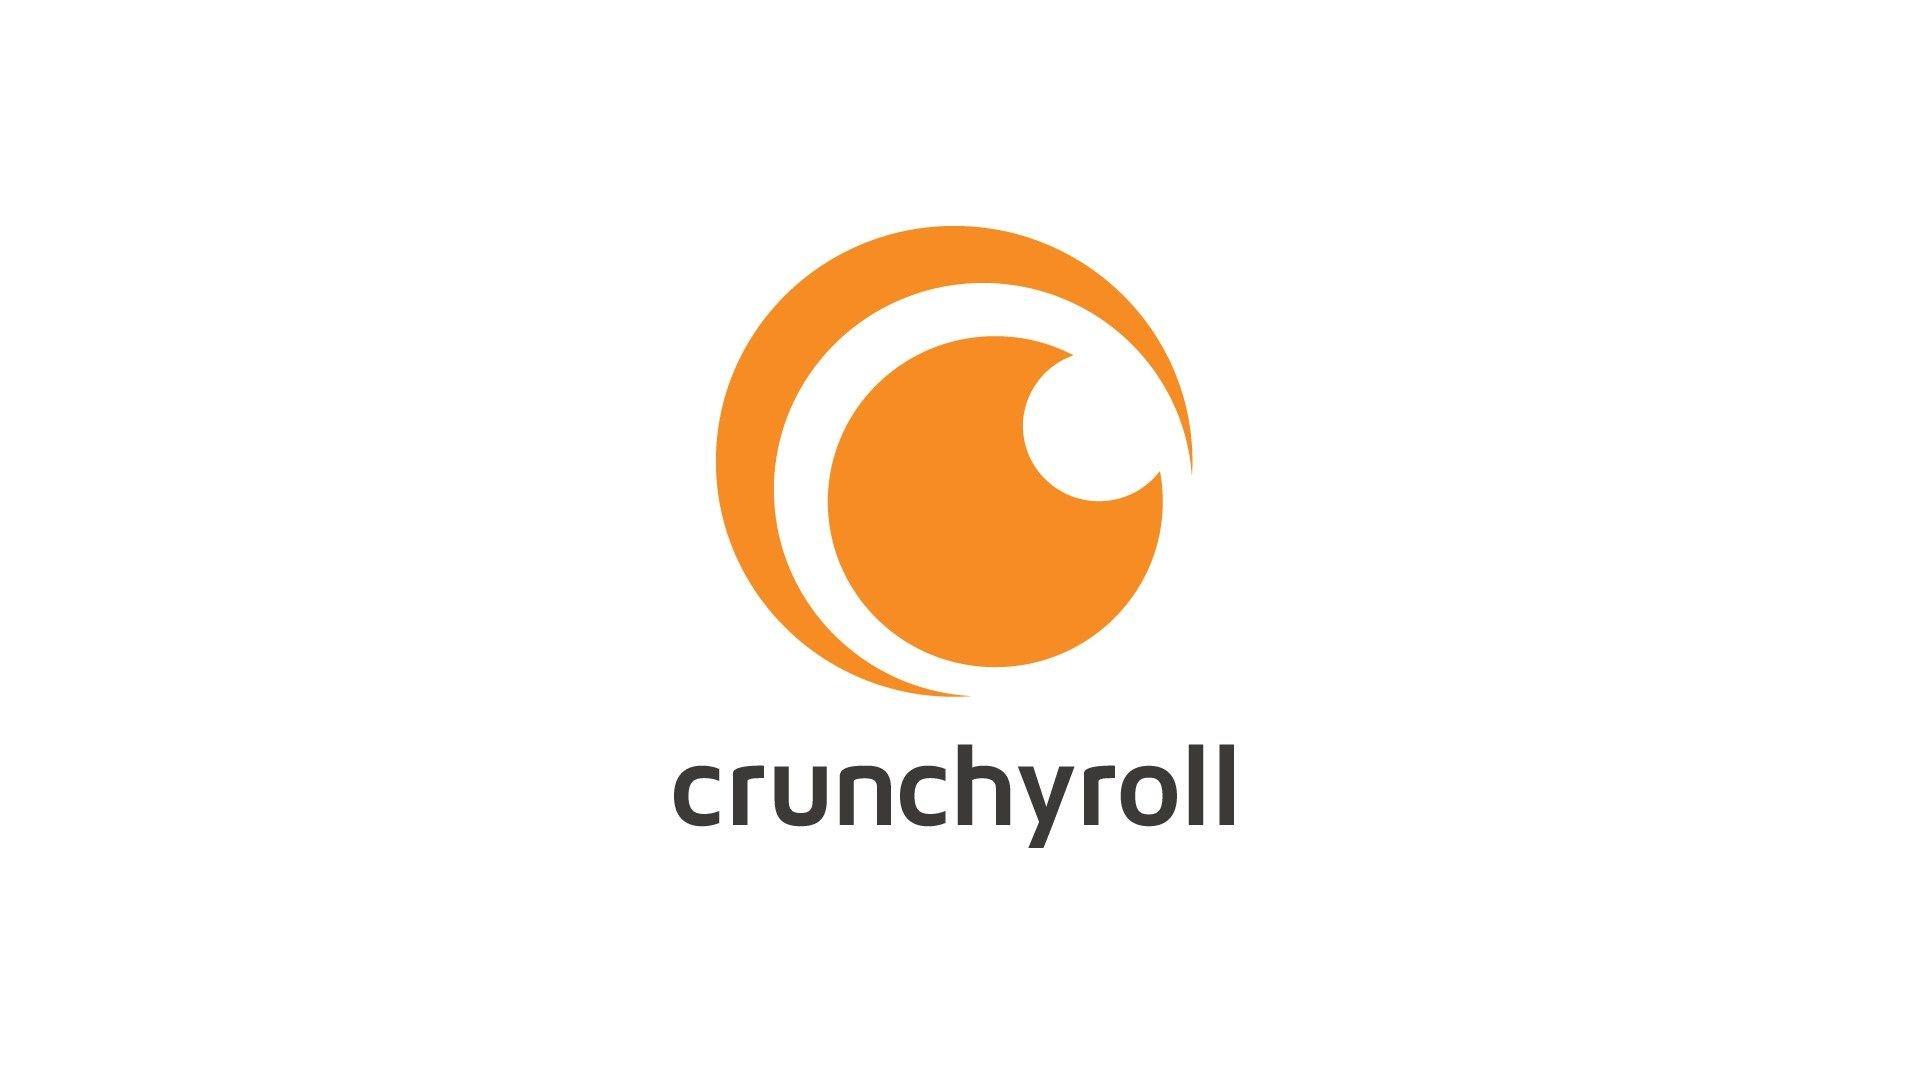 Crunchyroll Know Your Meme